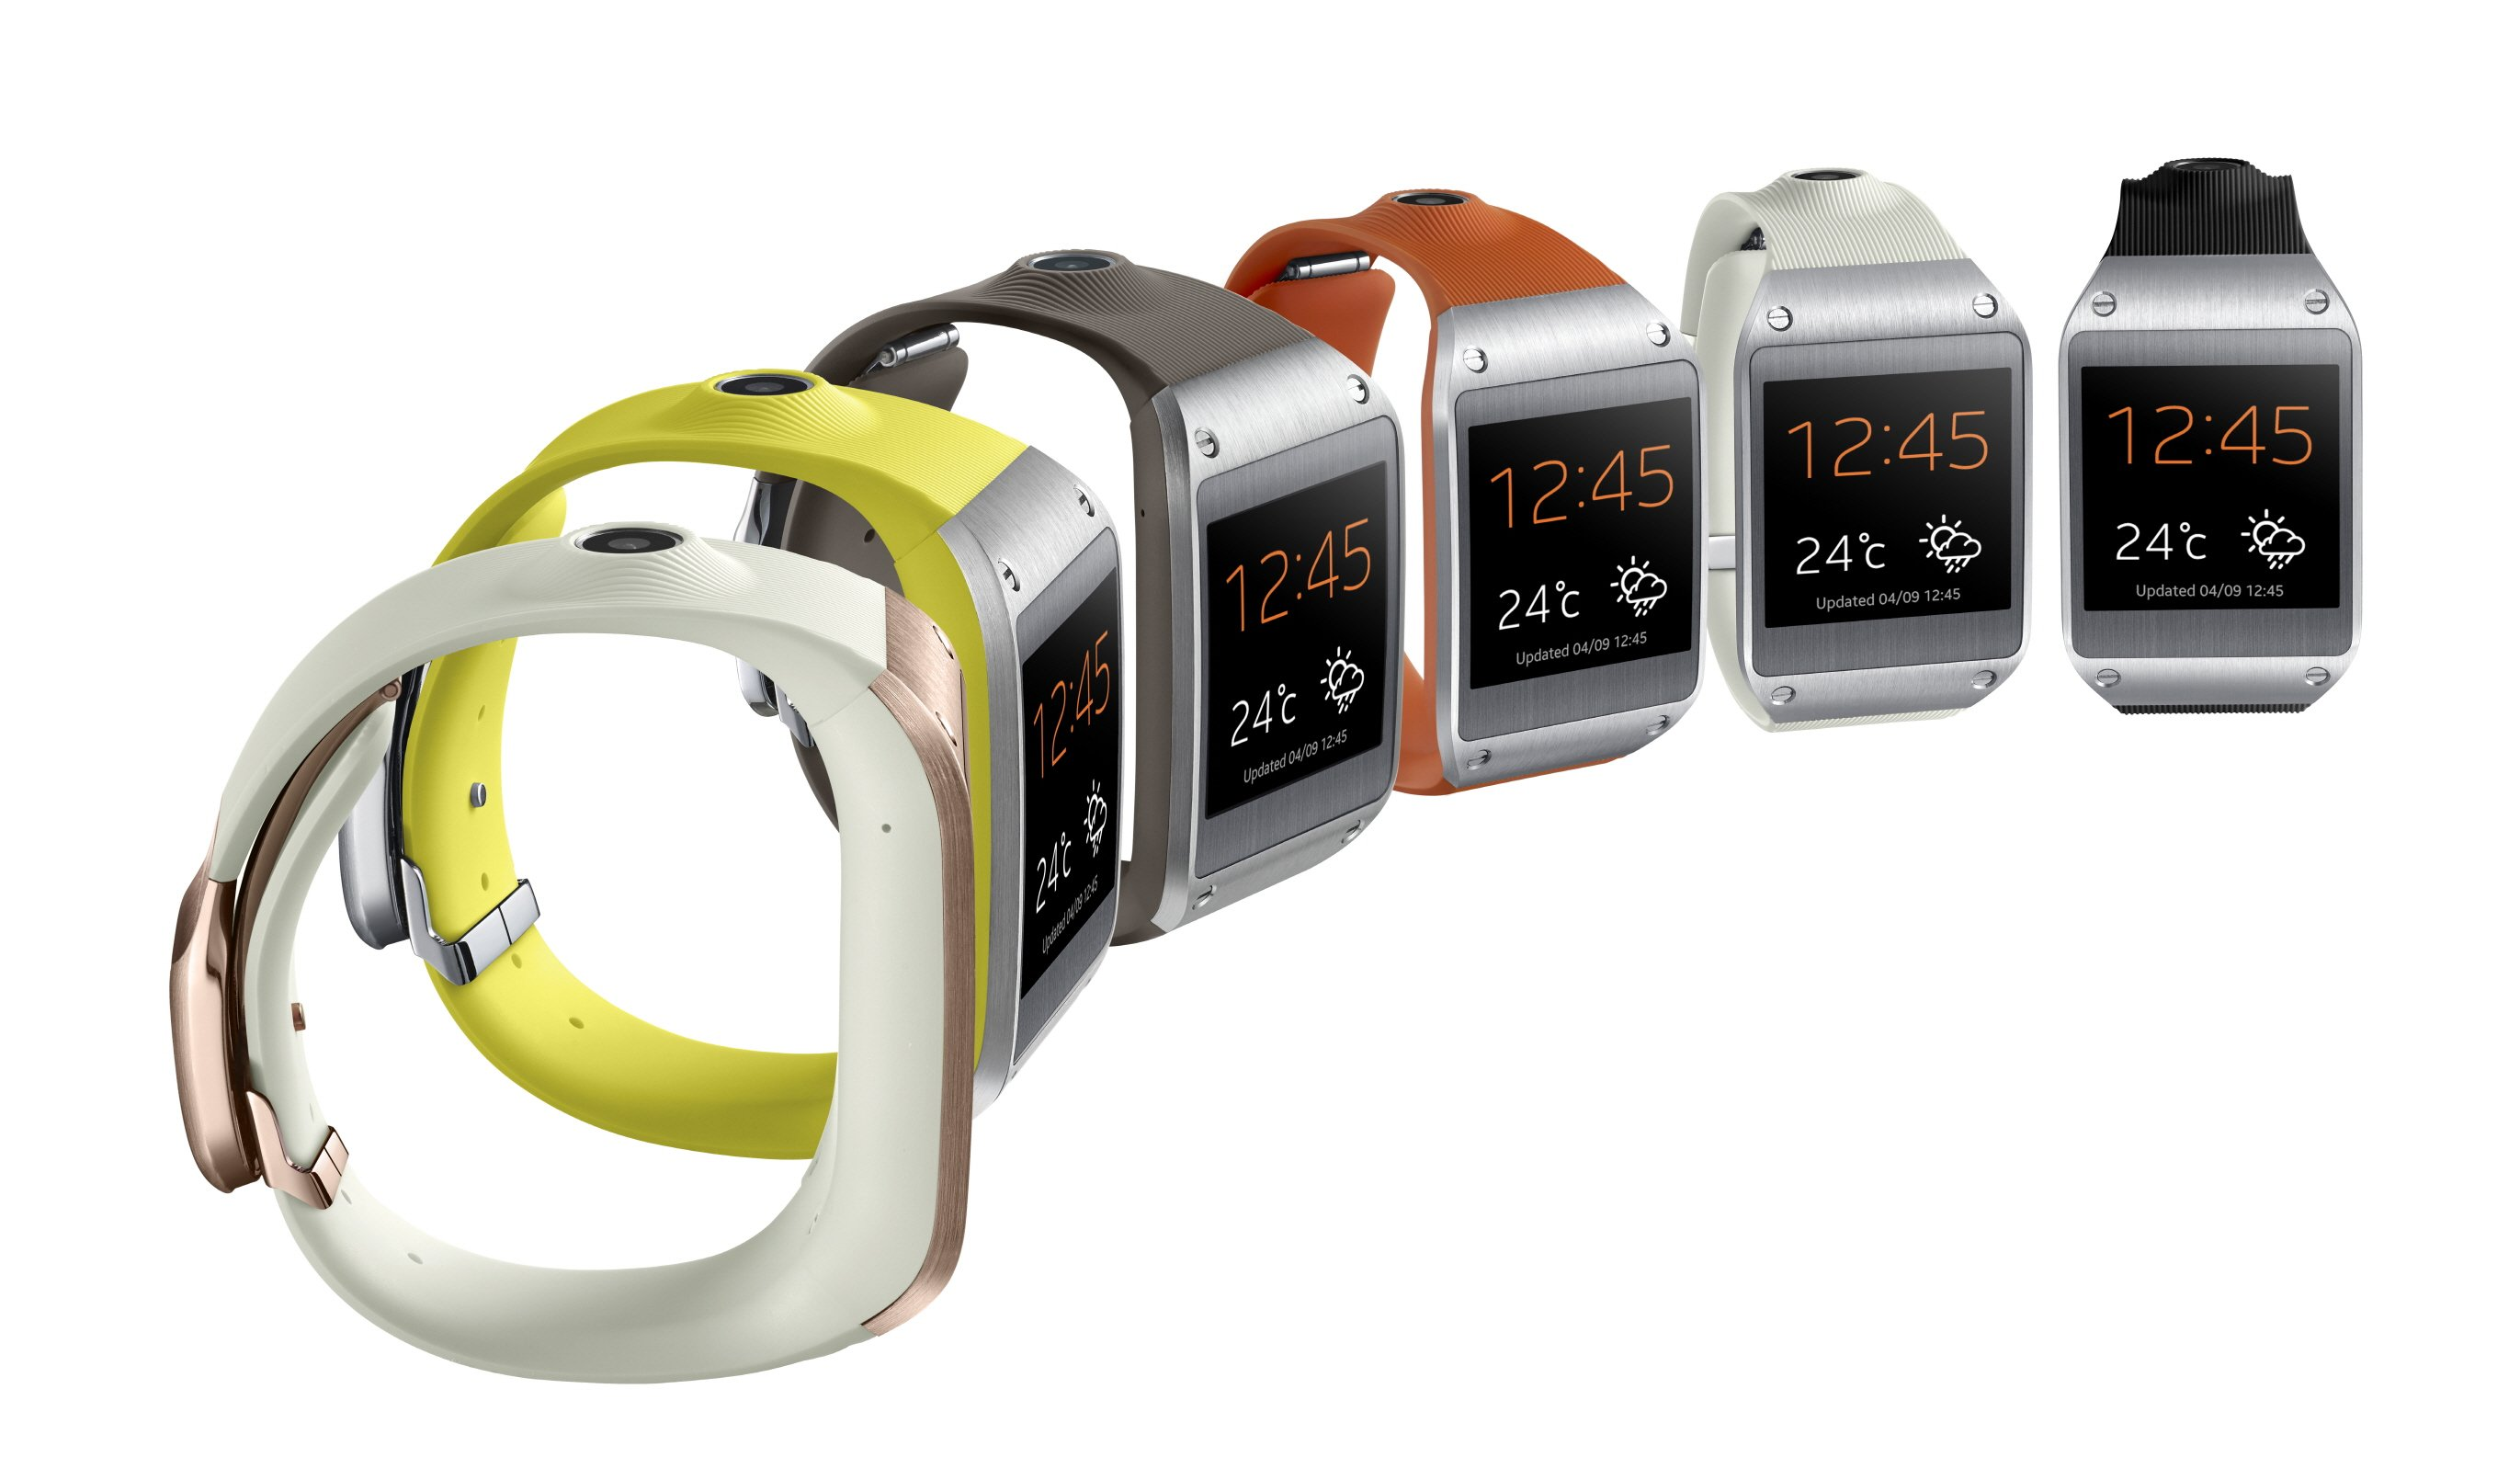 Samsung Galaxy Gear announced for September 25